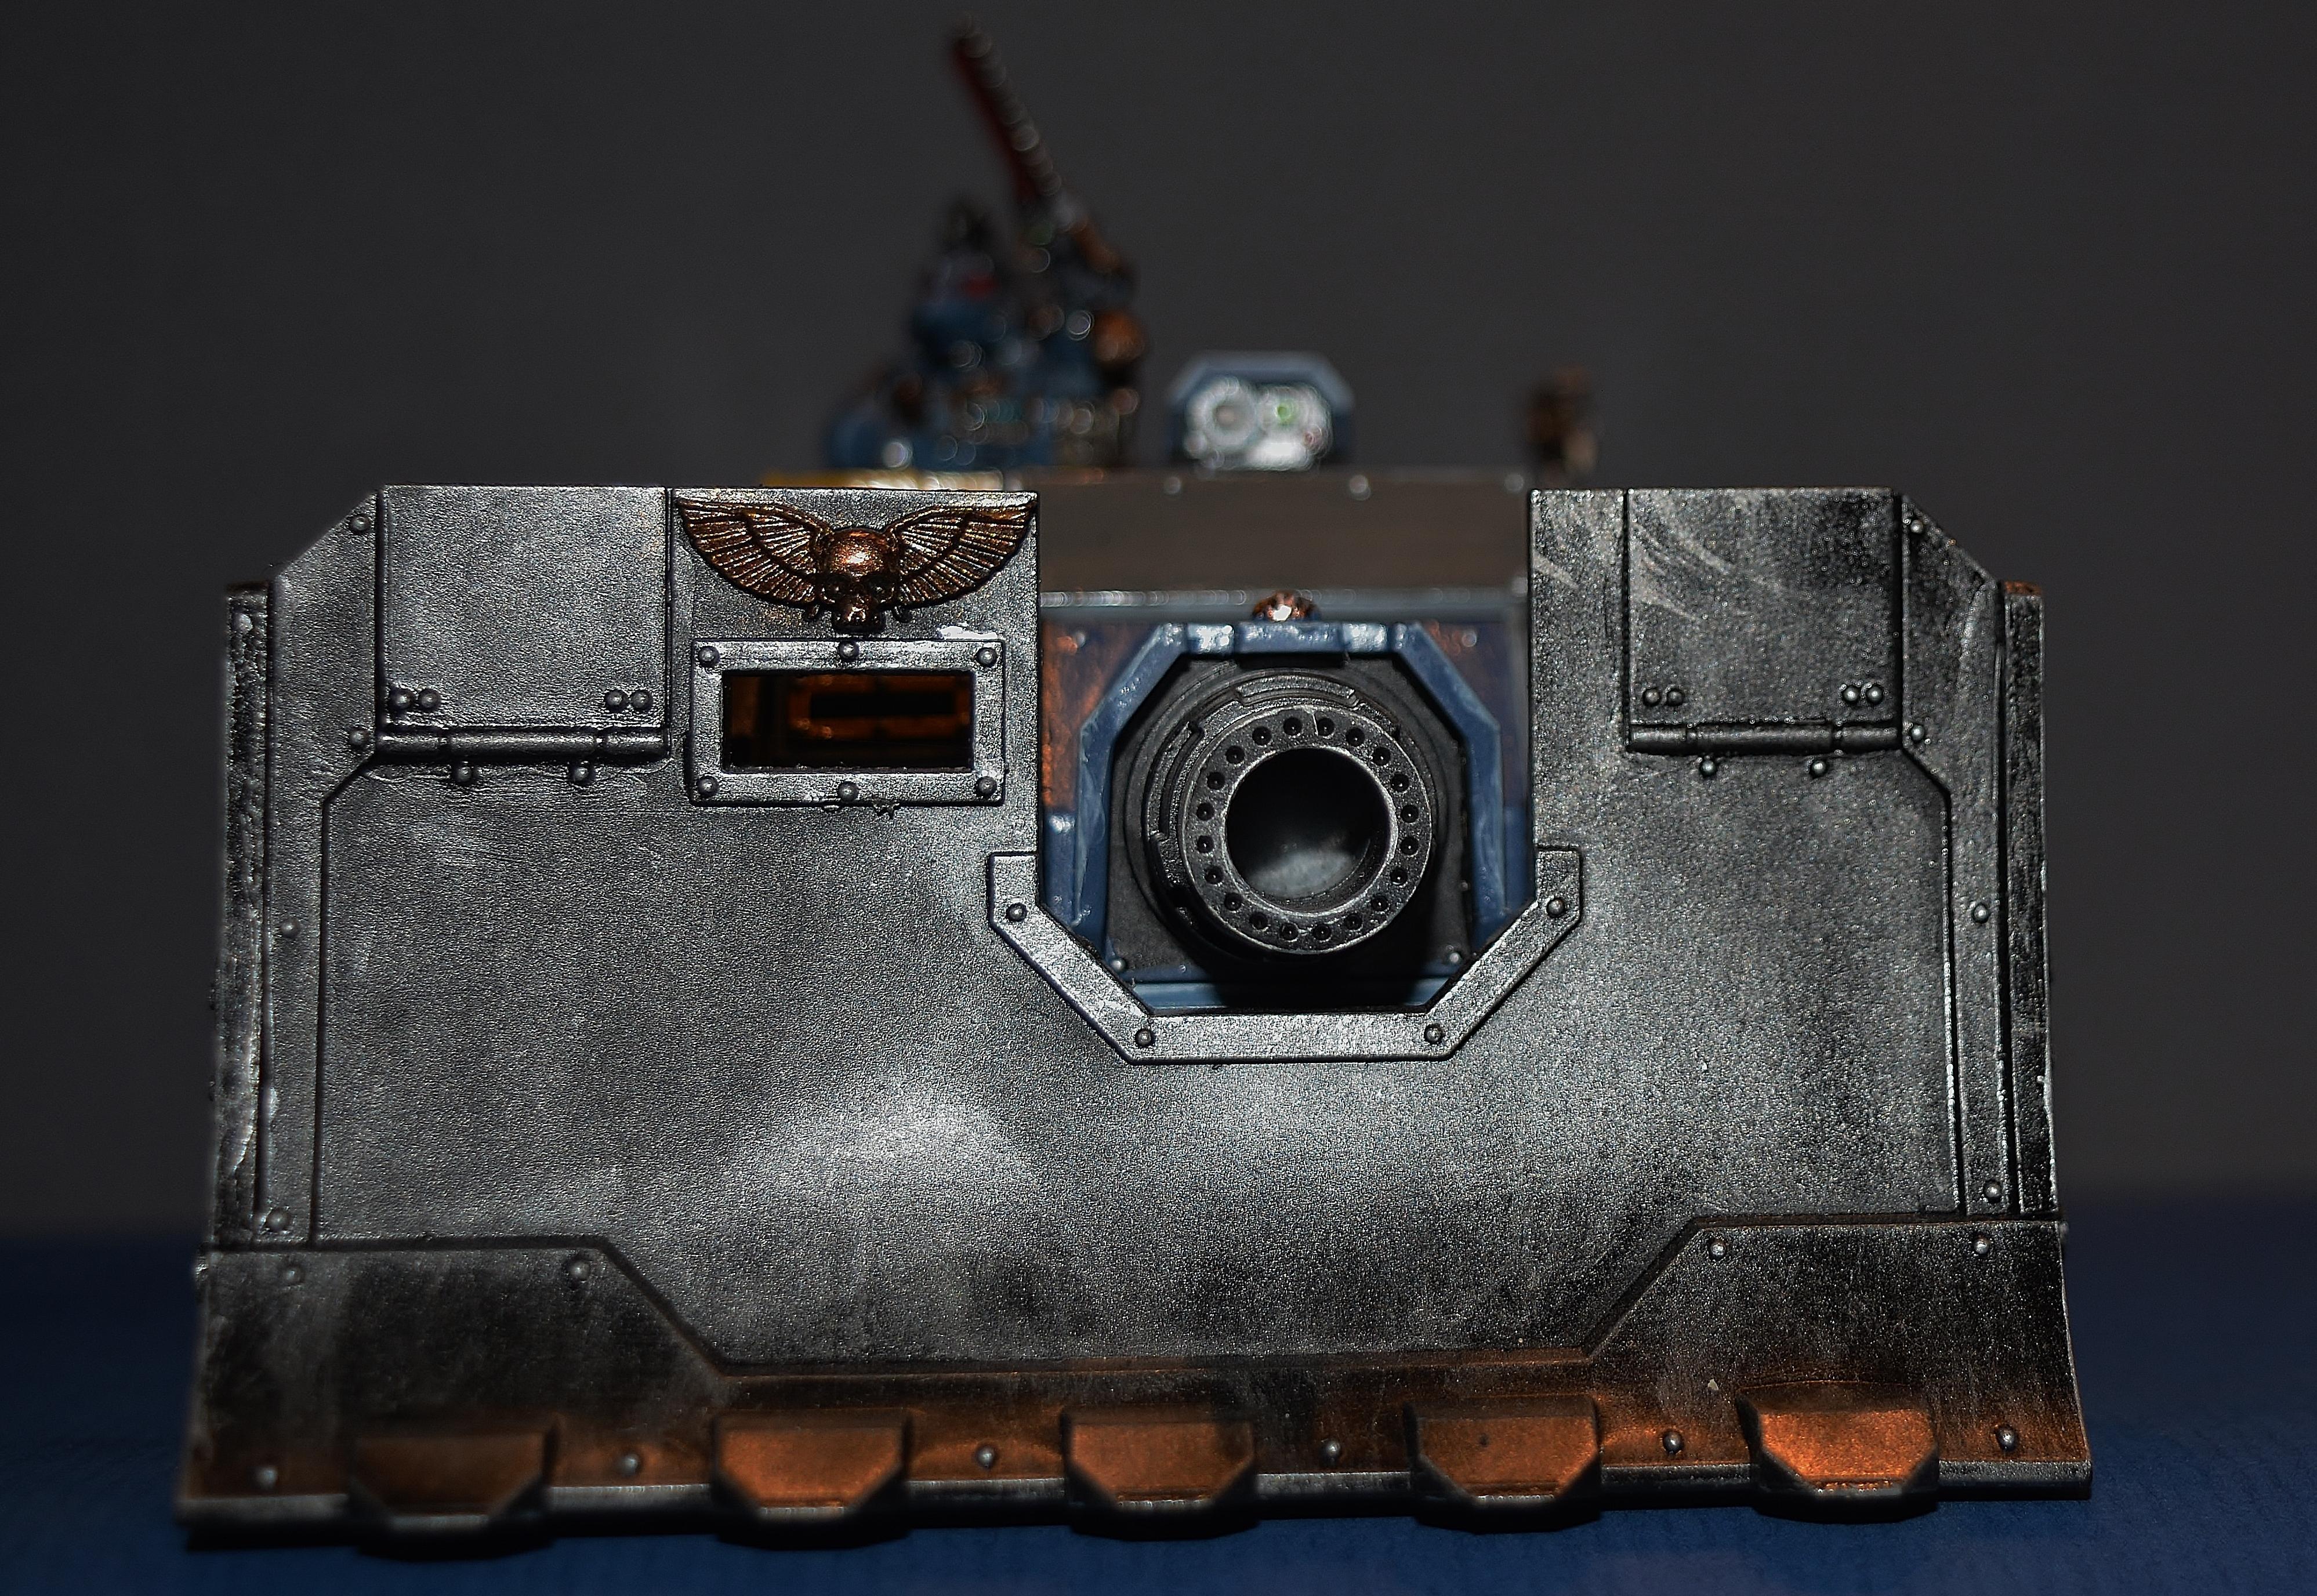 Boom, Cannon, Heavy, Rhino, Space Marines, Space Wolves, Tank, Vindicator, Wulfen